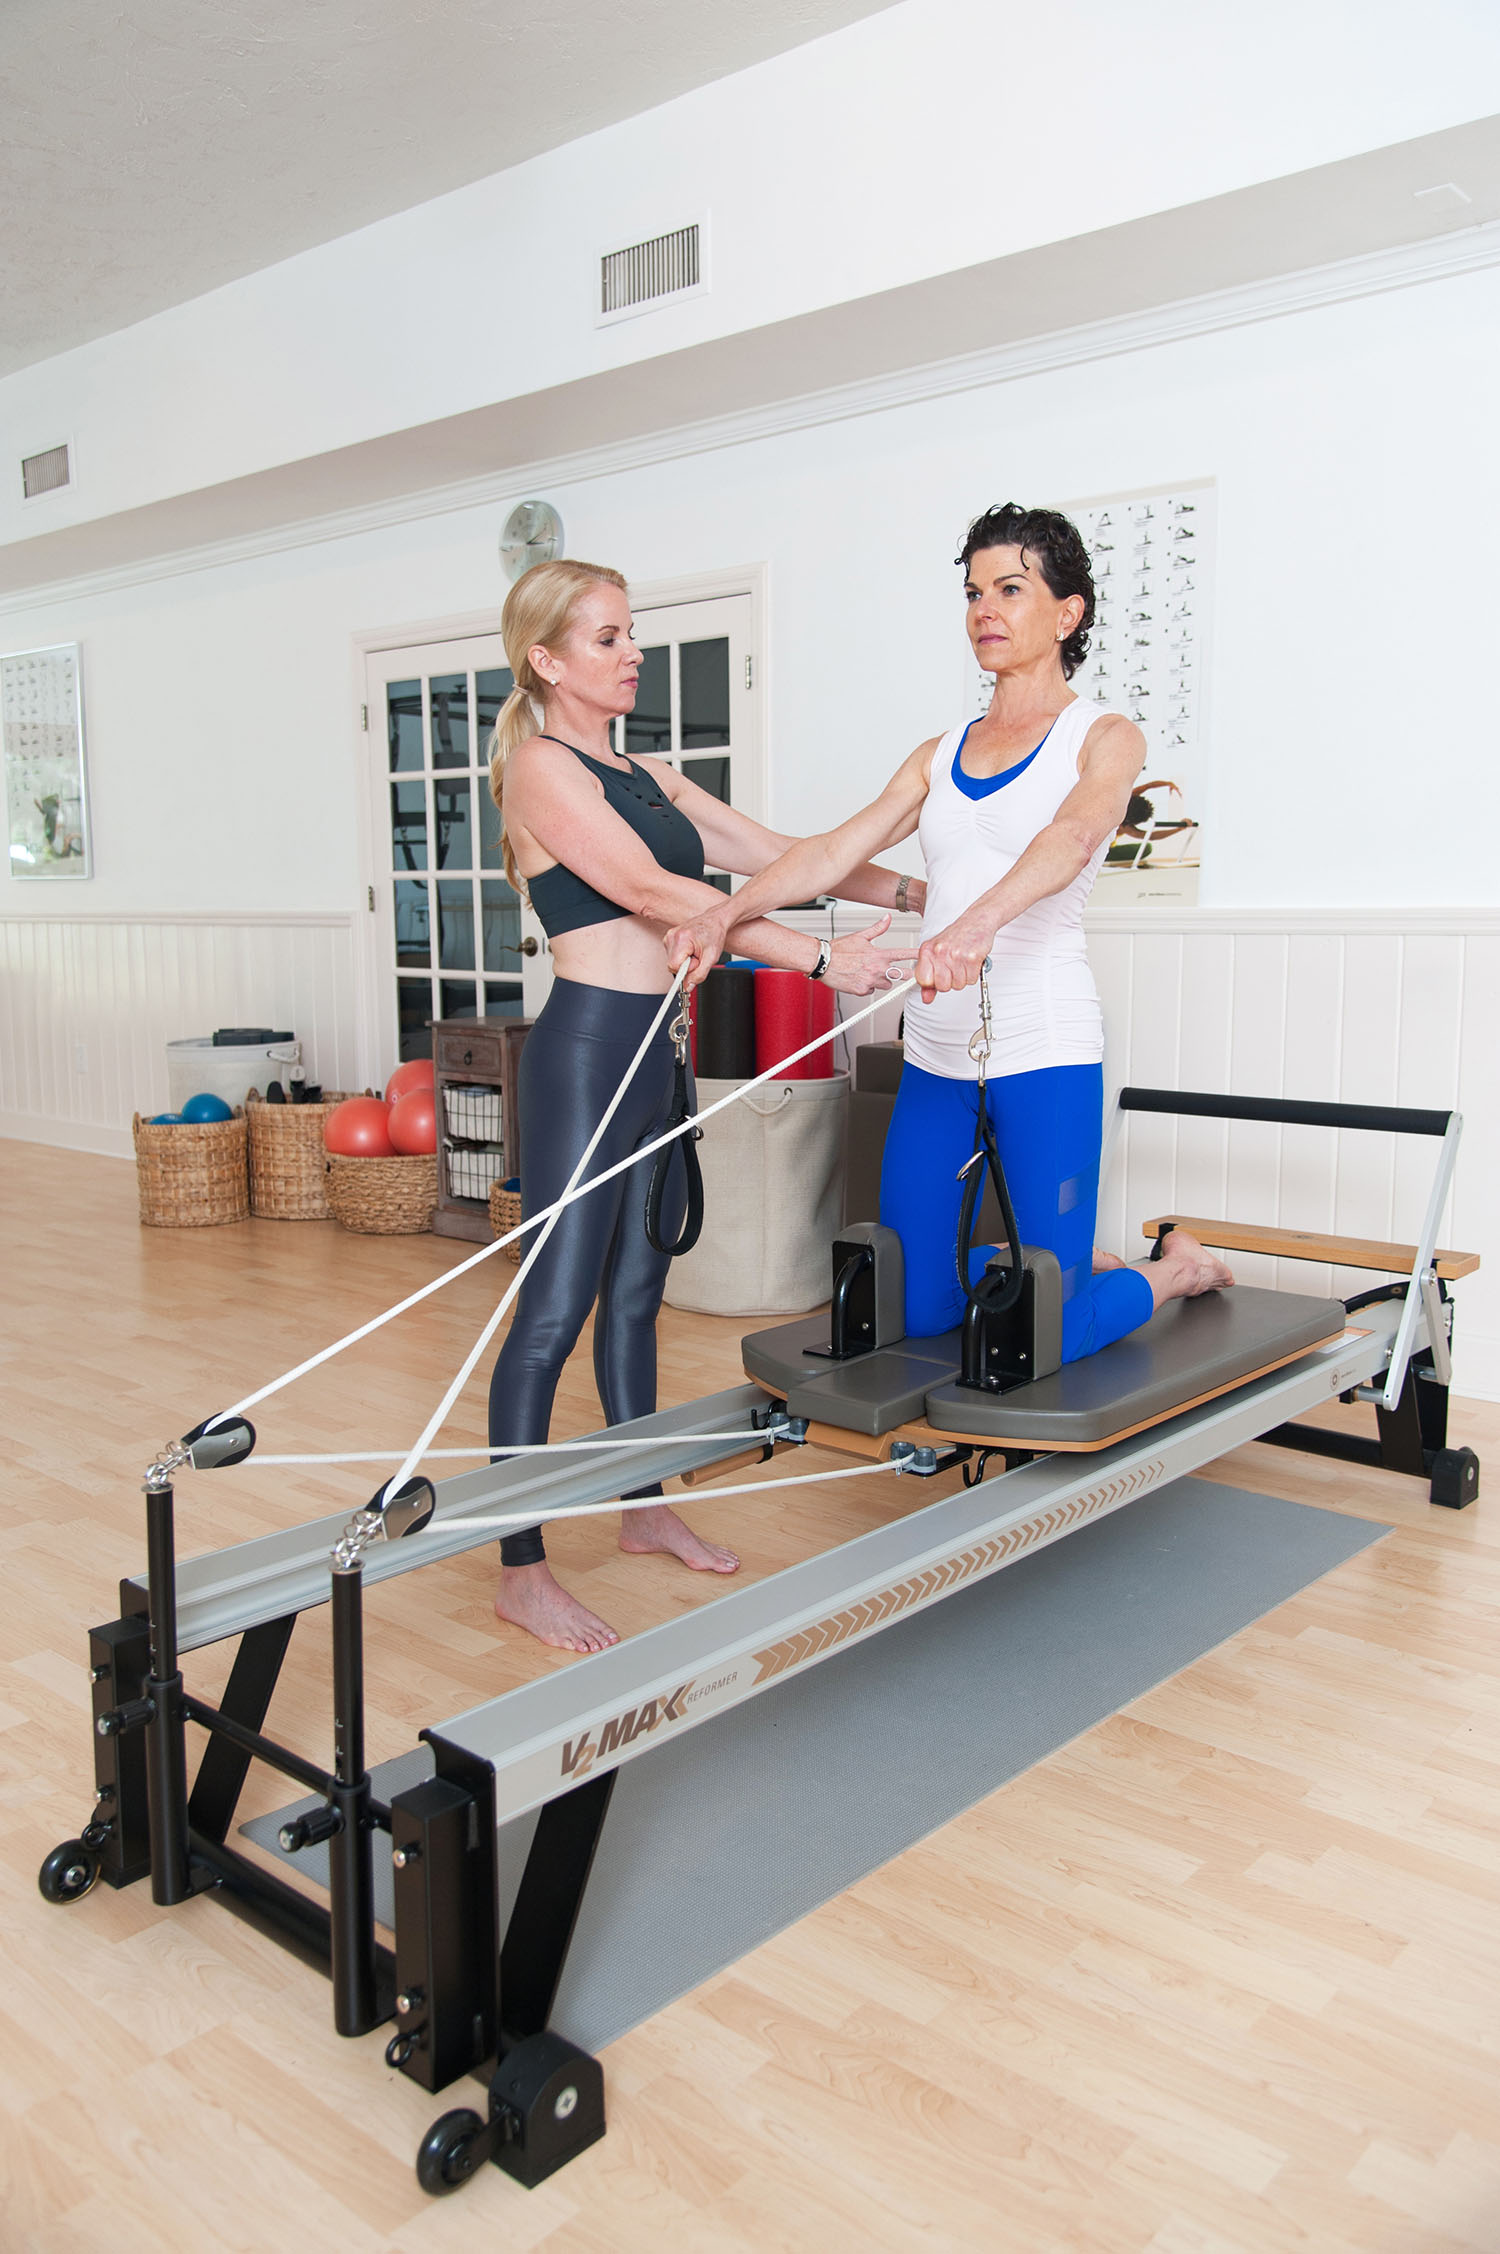 Private Pilates Sessions with Nina Desloge at her sarasota studio, Pilates Works of Sarasota.